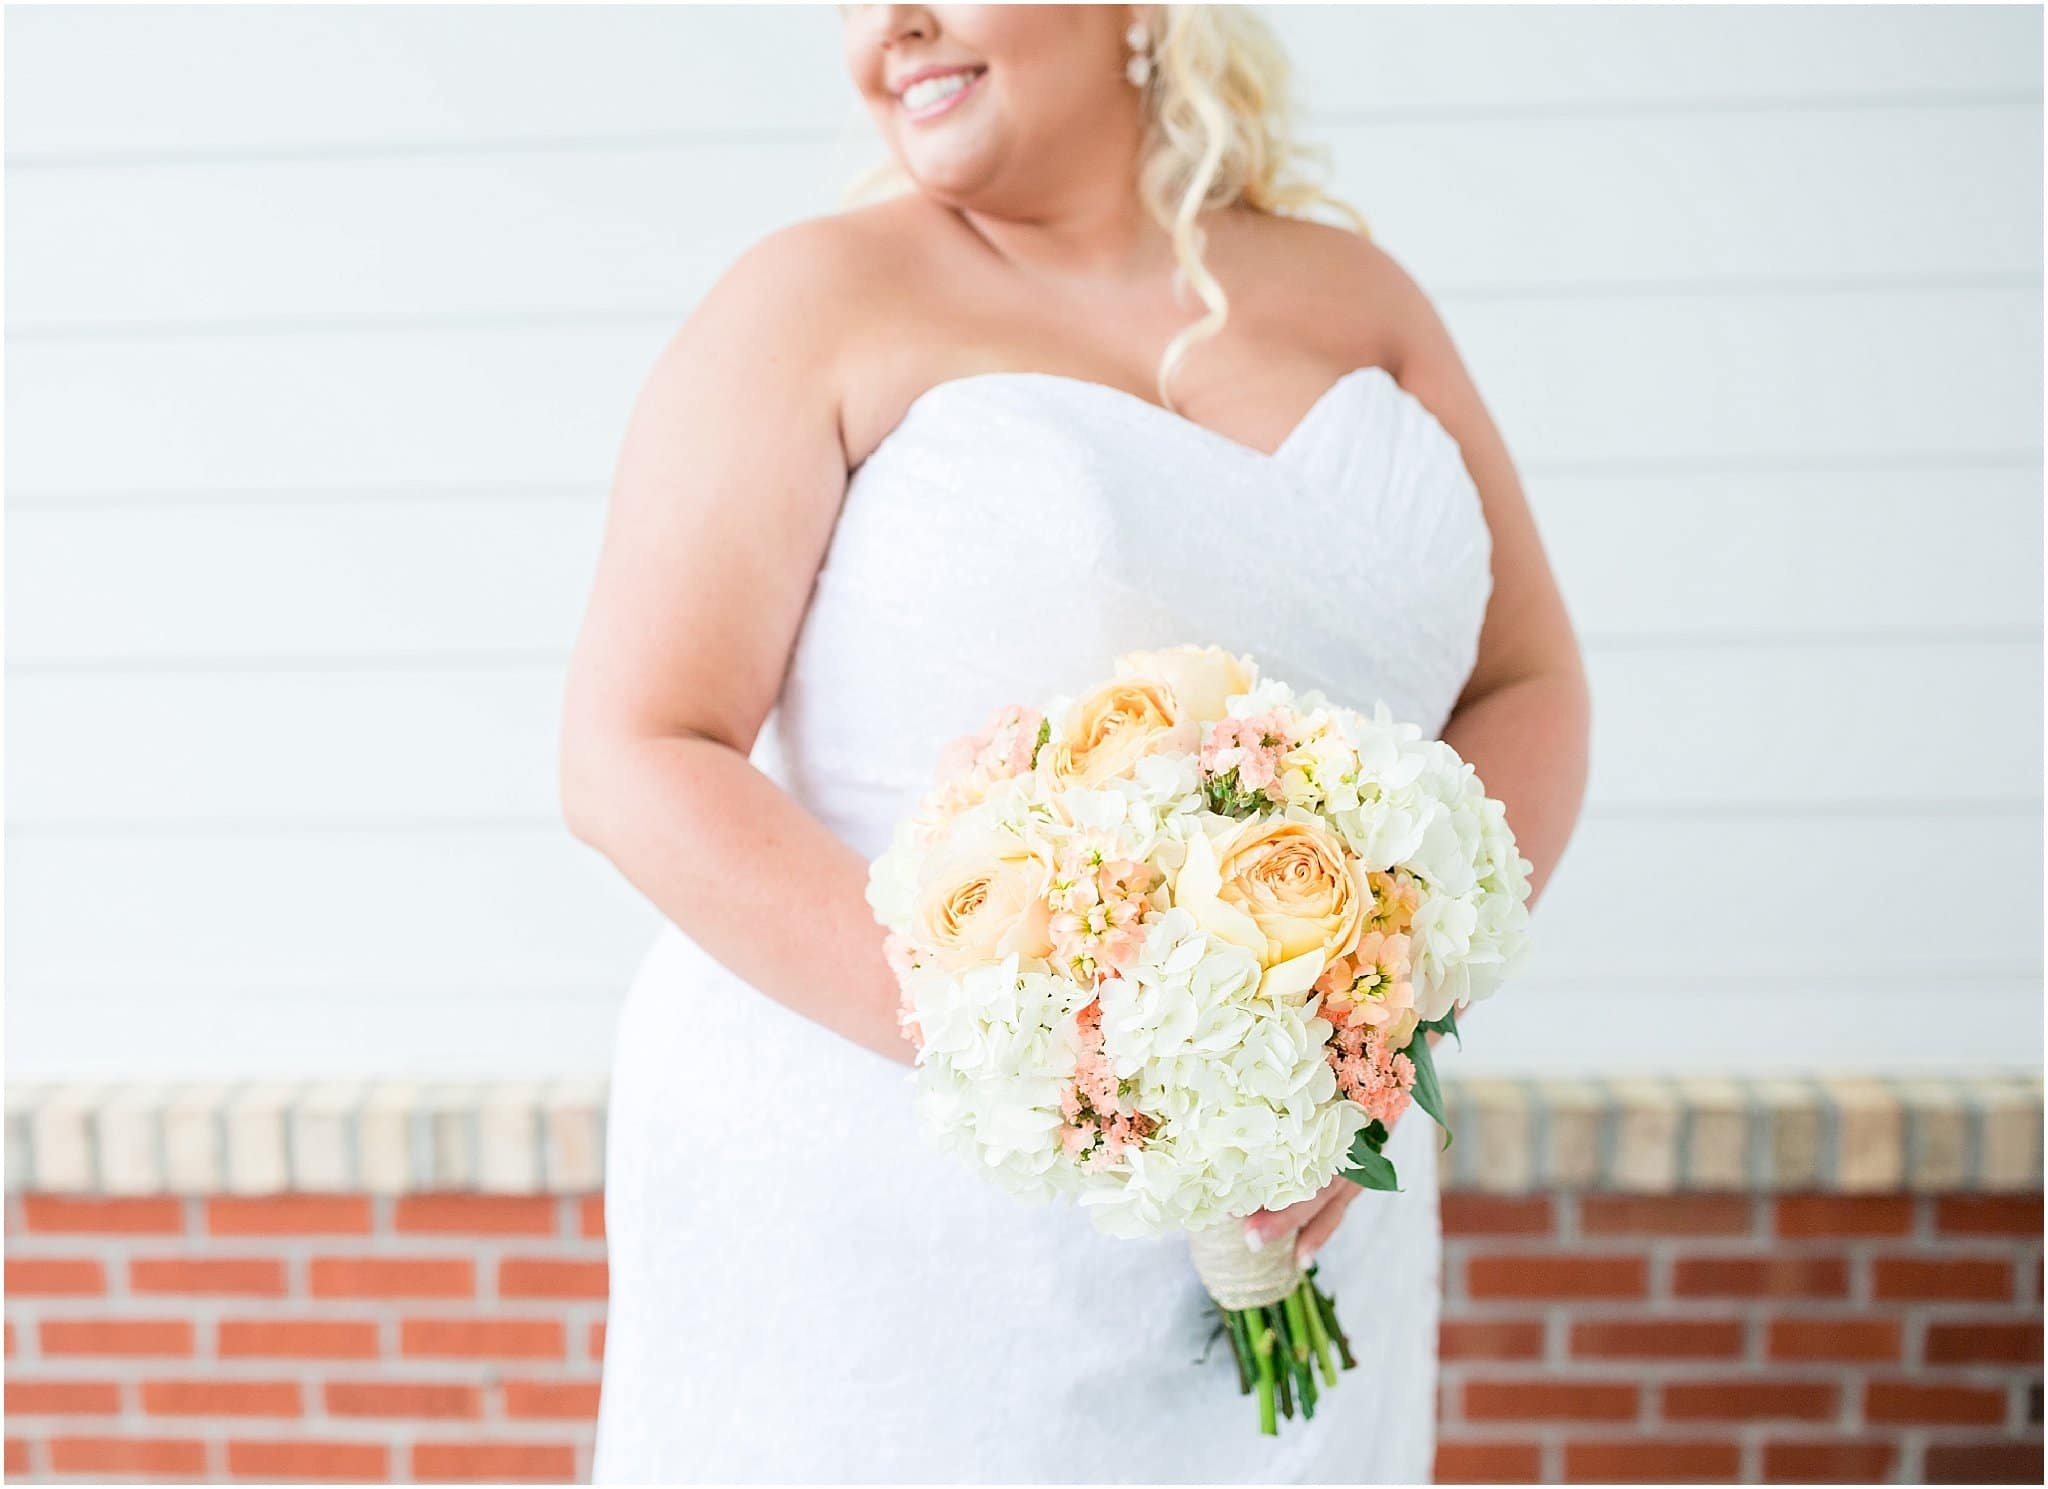 jessscott-milsboro-delaware-wedding-cassidymrphotography_0022